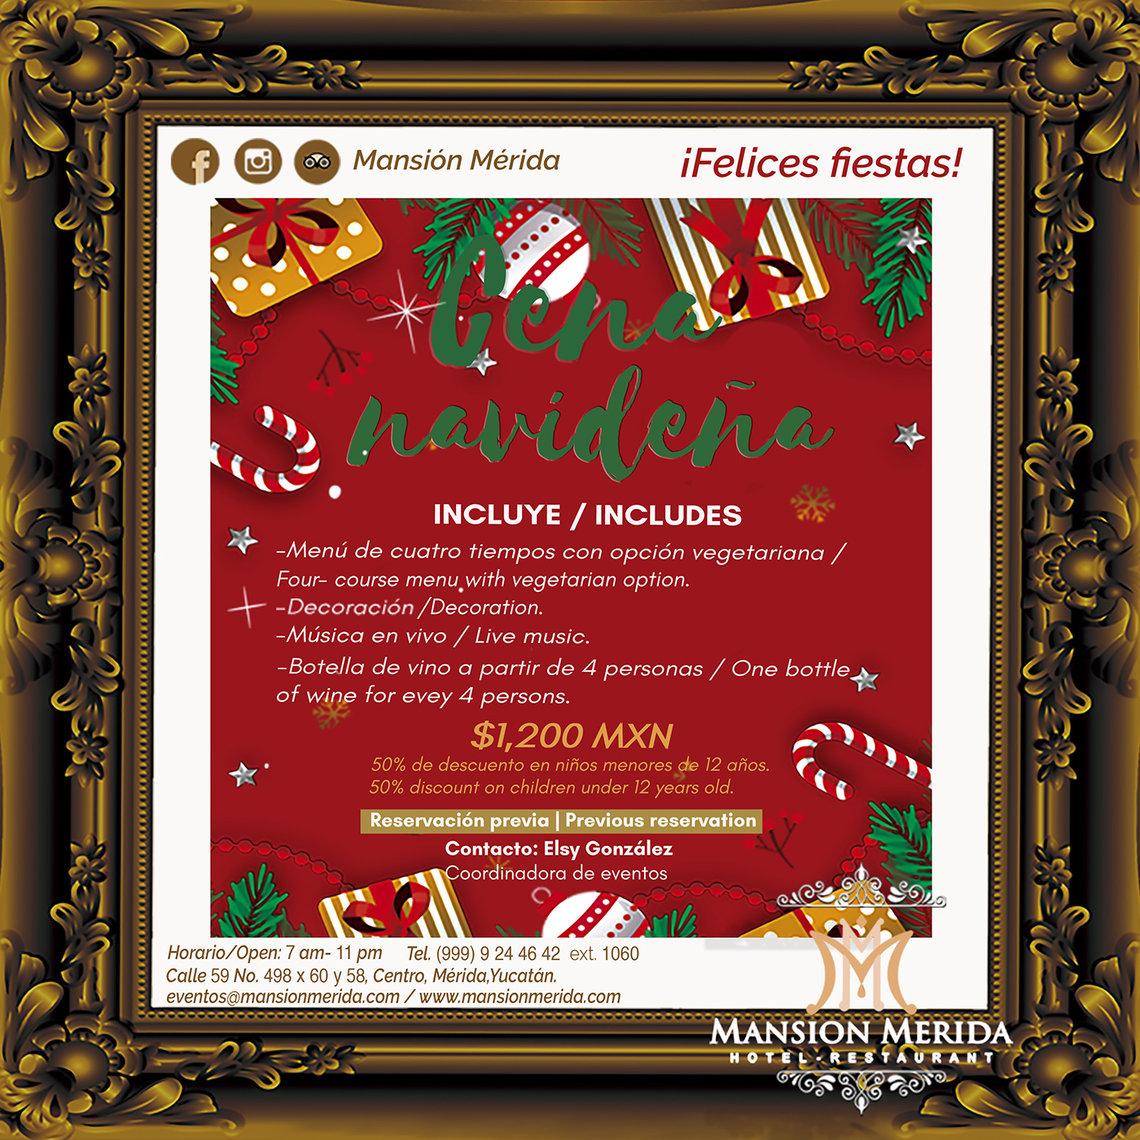 Mansion Merida Hotel - Restaurant